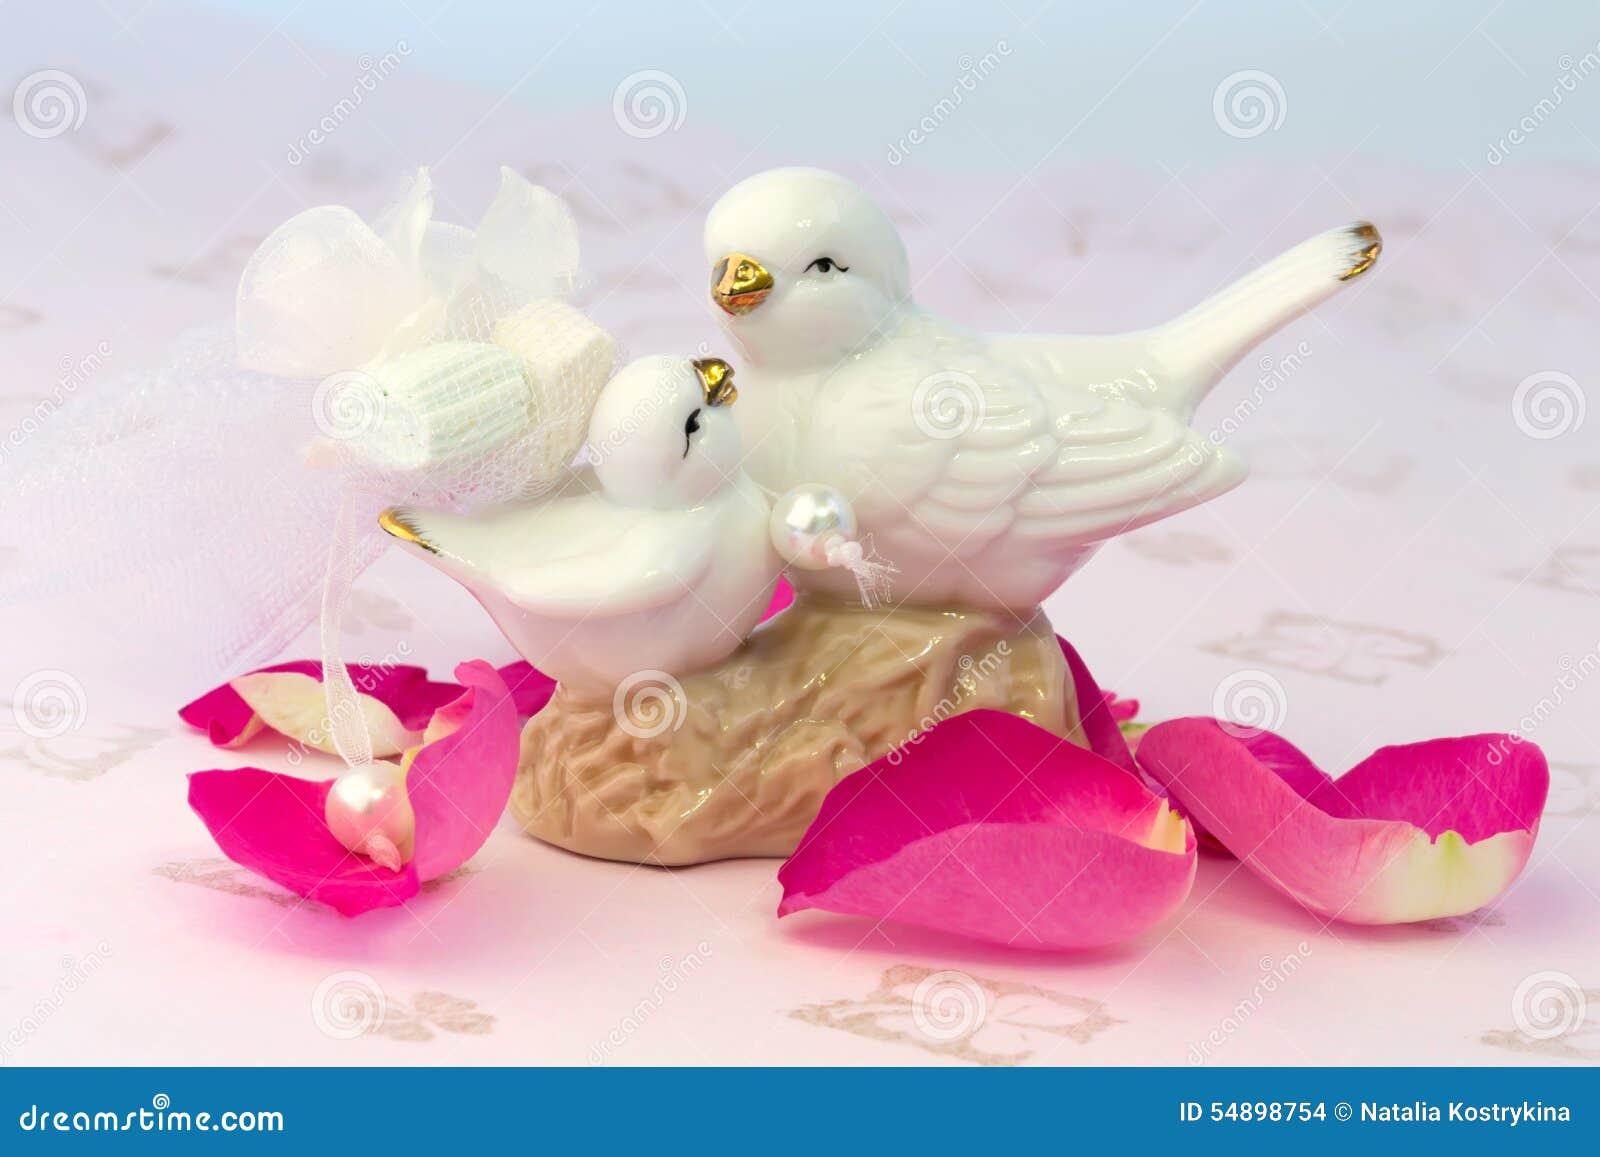 Figurines Of Lovers Pair Of Wedding Doves Valentine Love Stock Photo ...